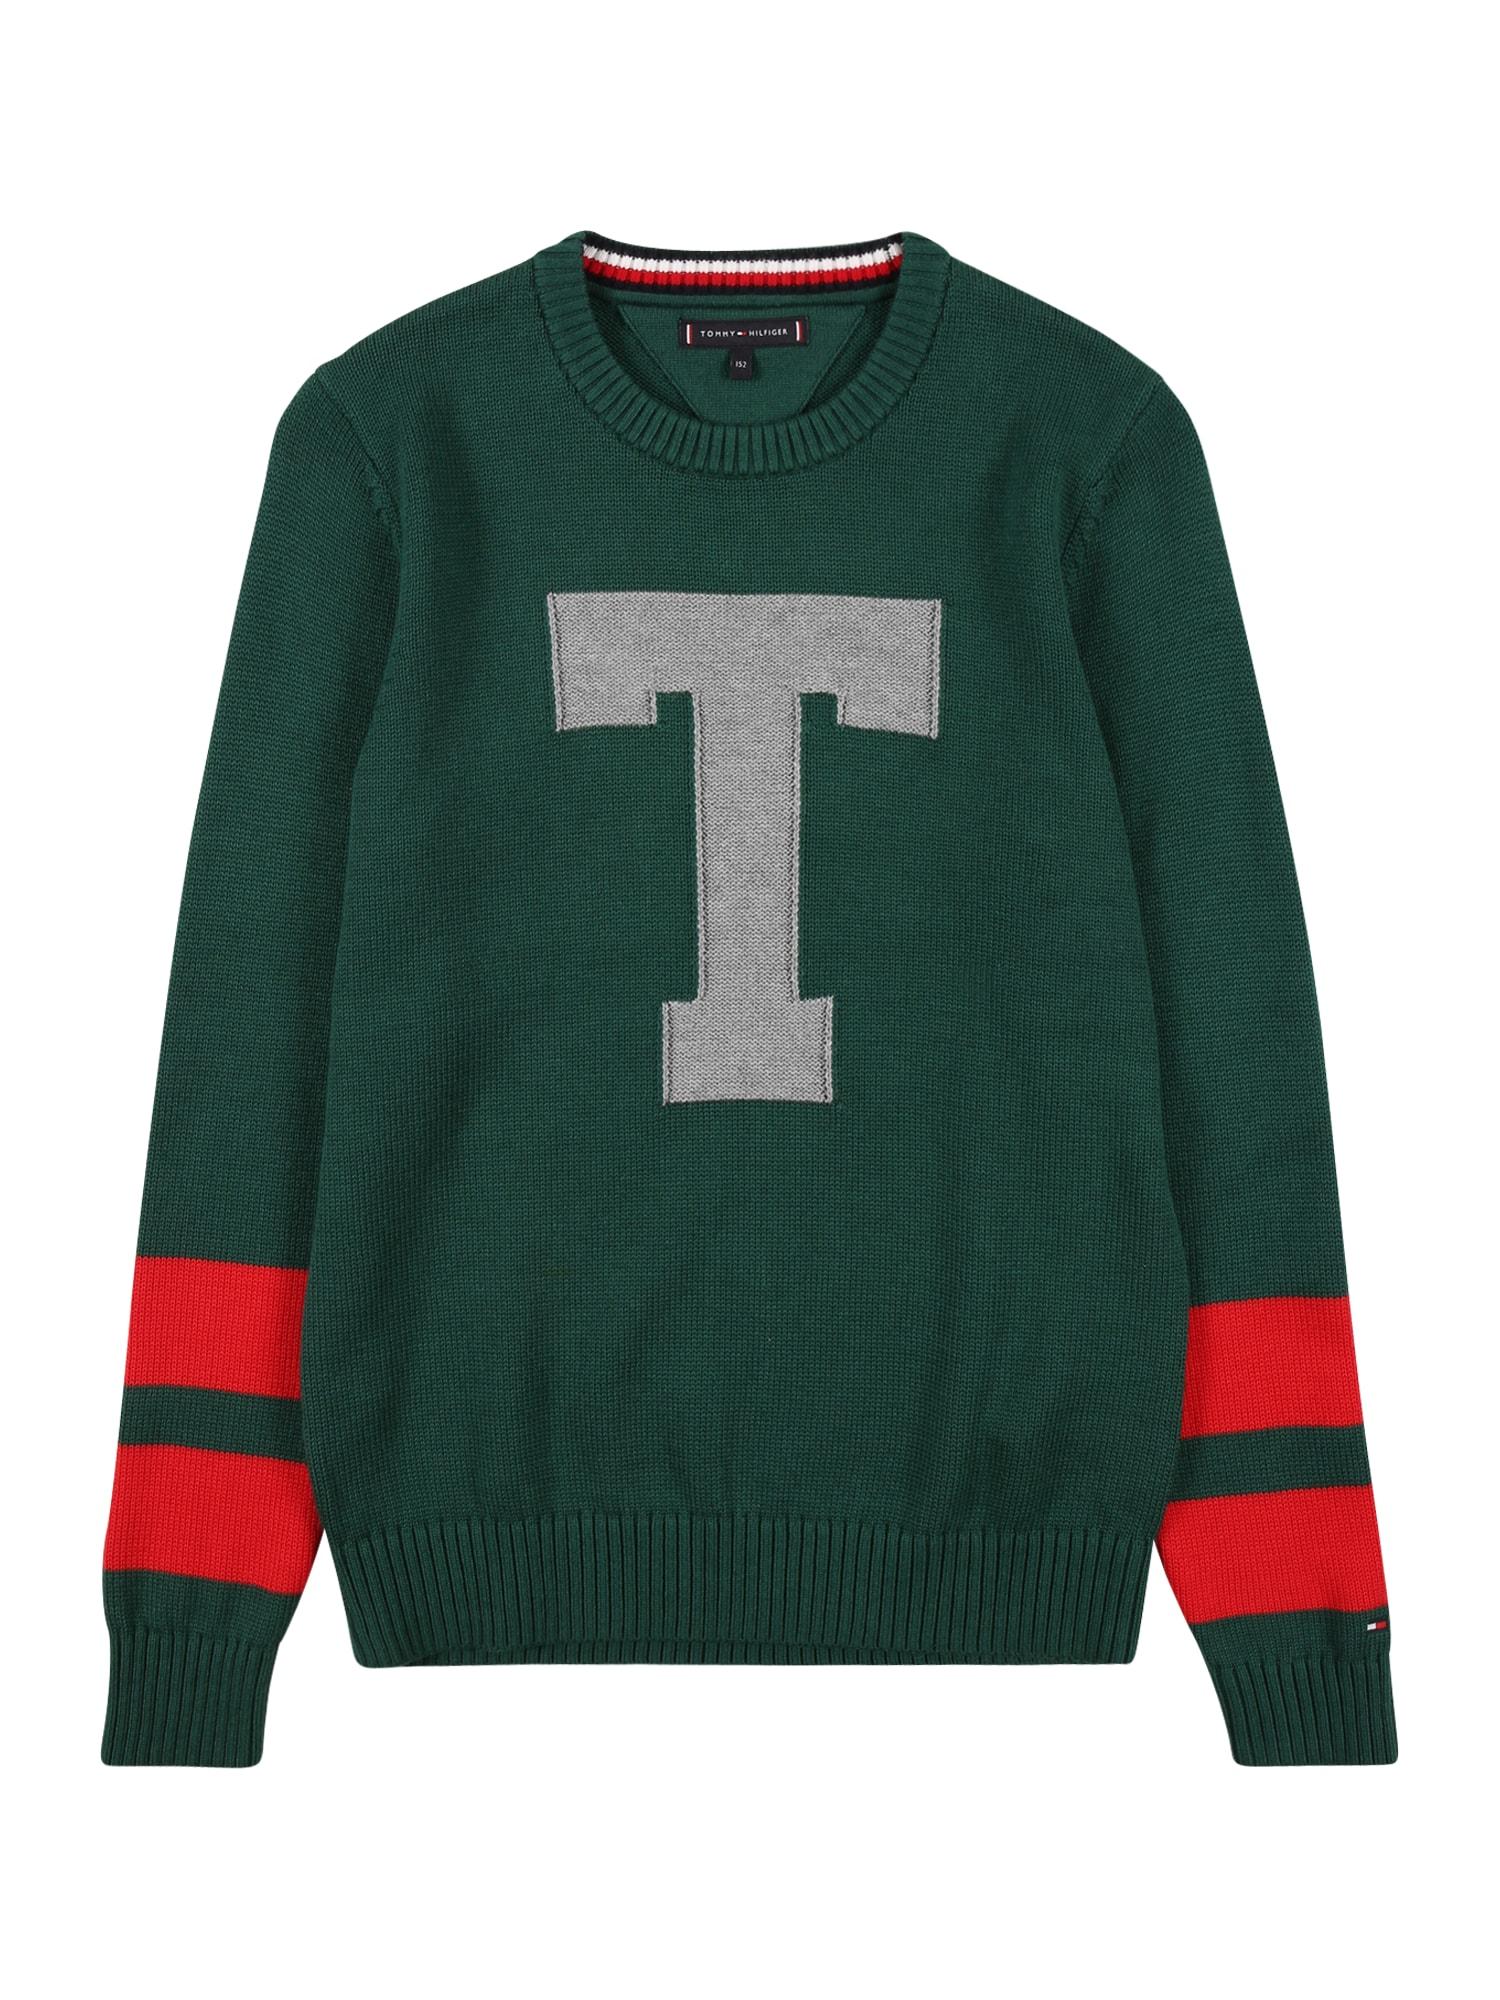 TOMMY HILFIGER Megztinis 'LETTER' žalia / pilka / raudona